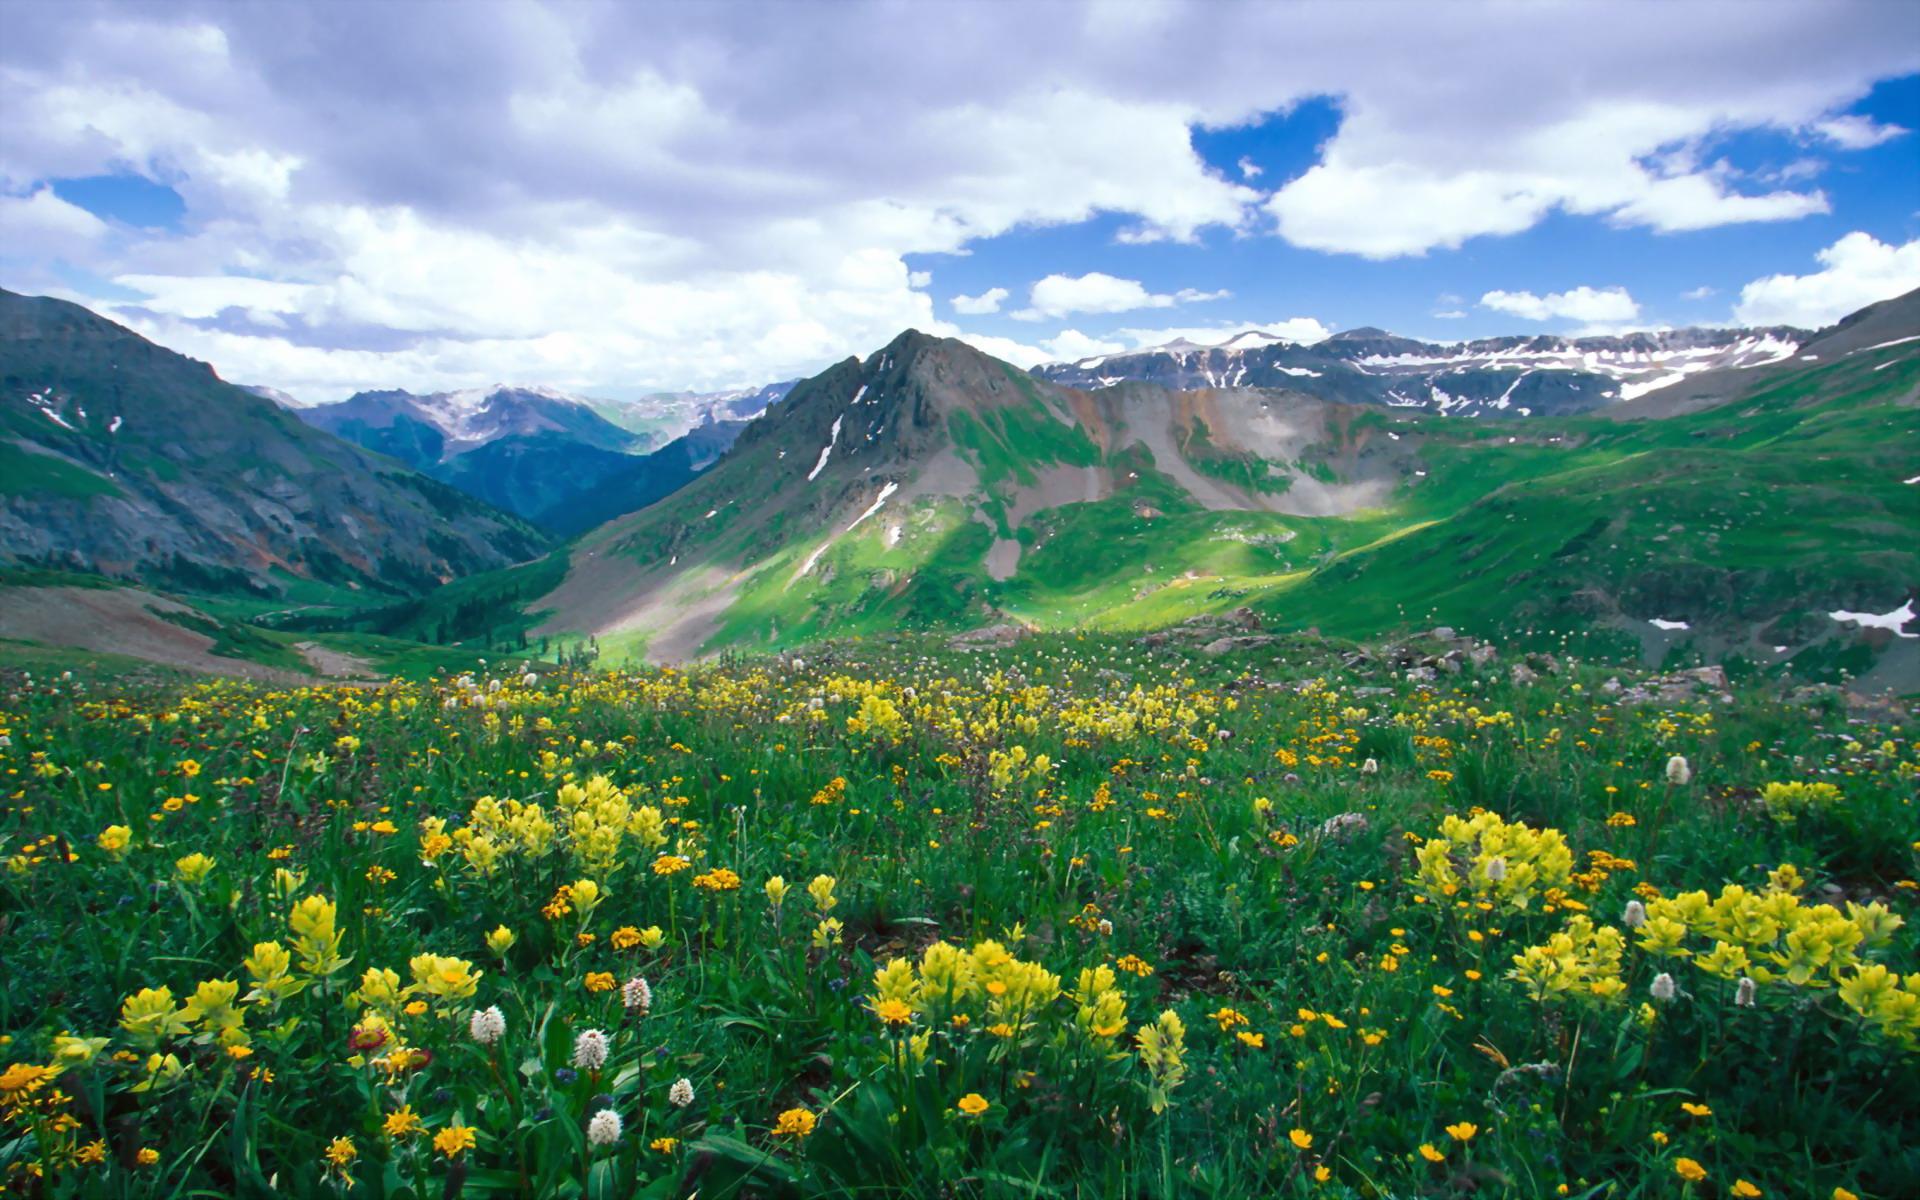 Basin Ouray Colorado   Around The World Photography Desktop Wallpapers 1920x1200